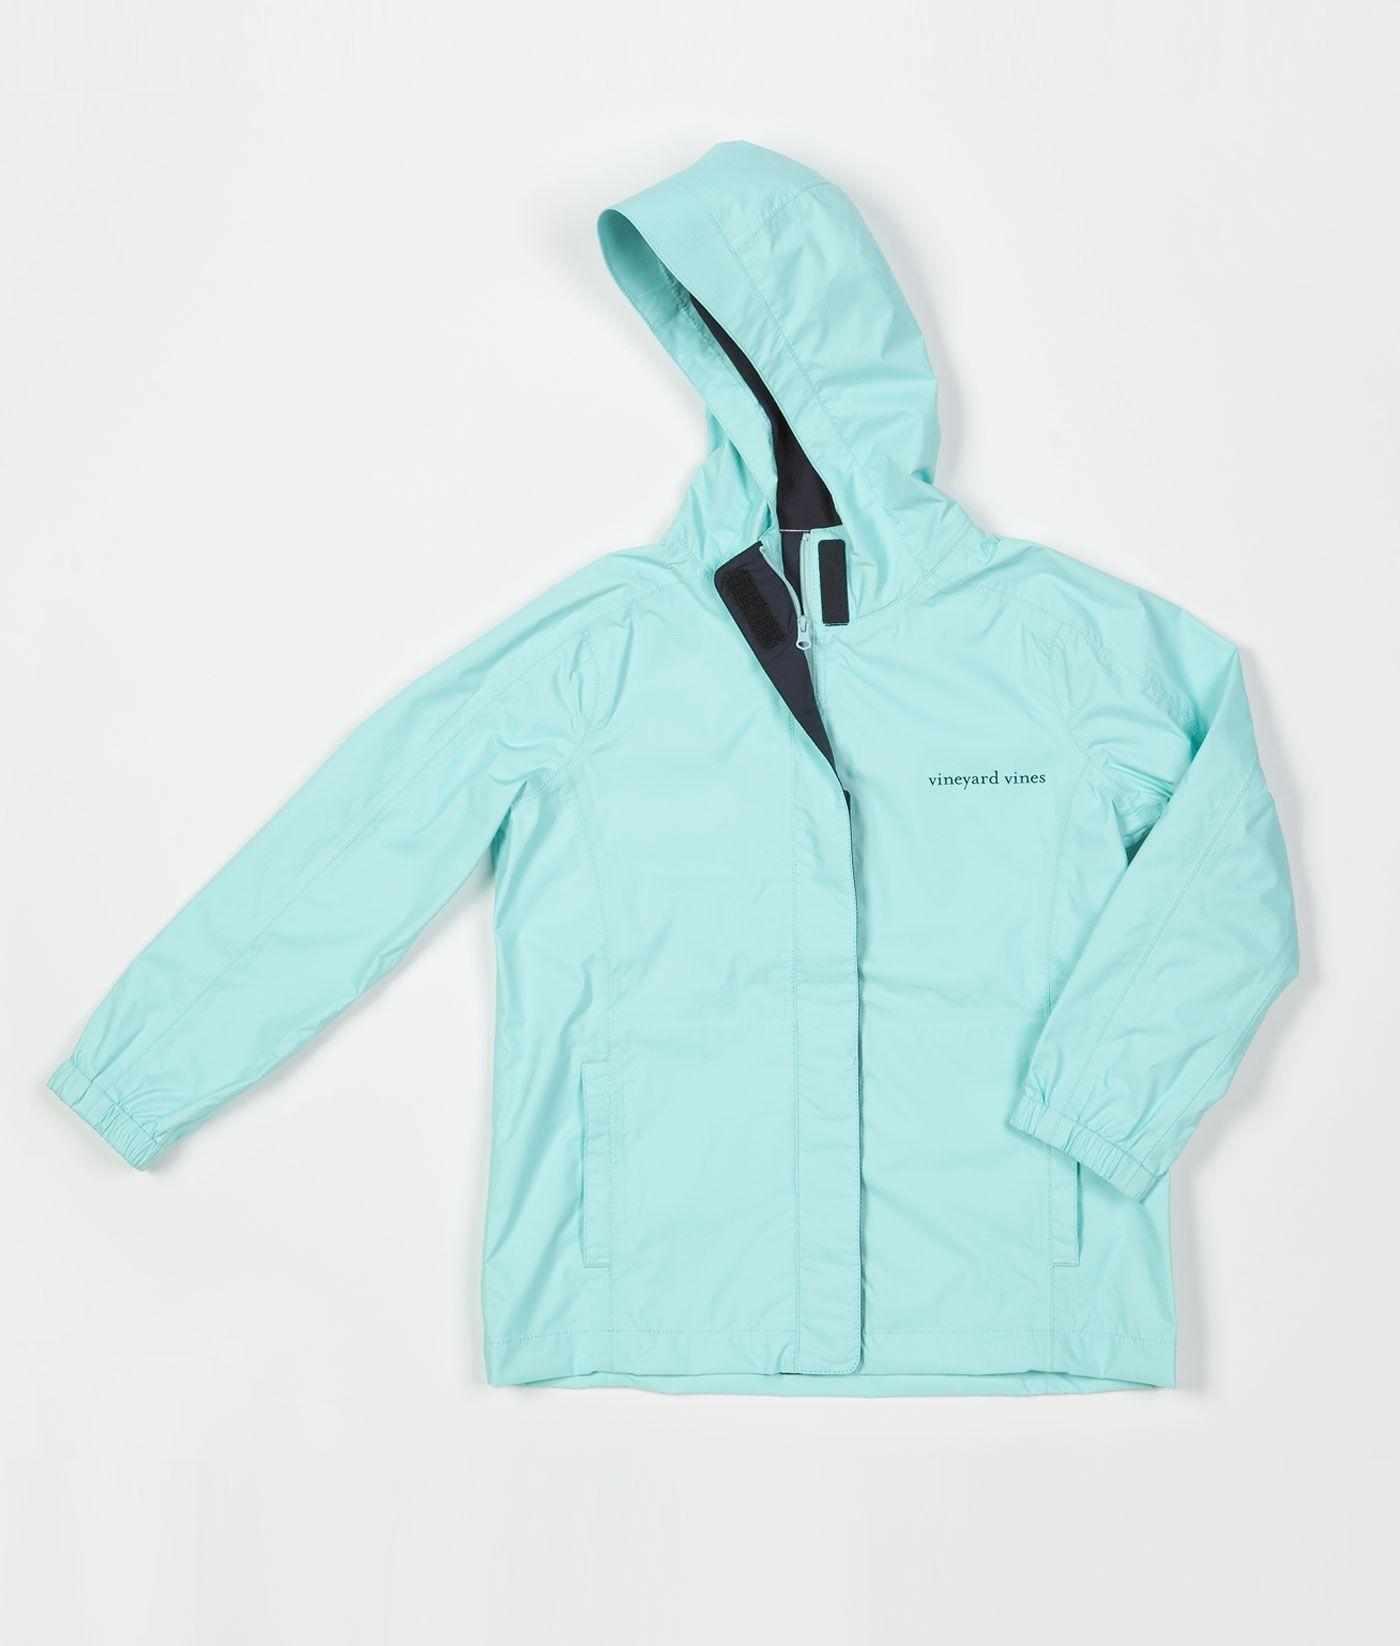 Girlsu outerwear stow u go rain jacket for girls vineyard vines